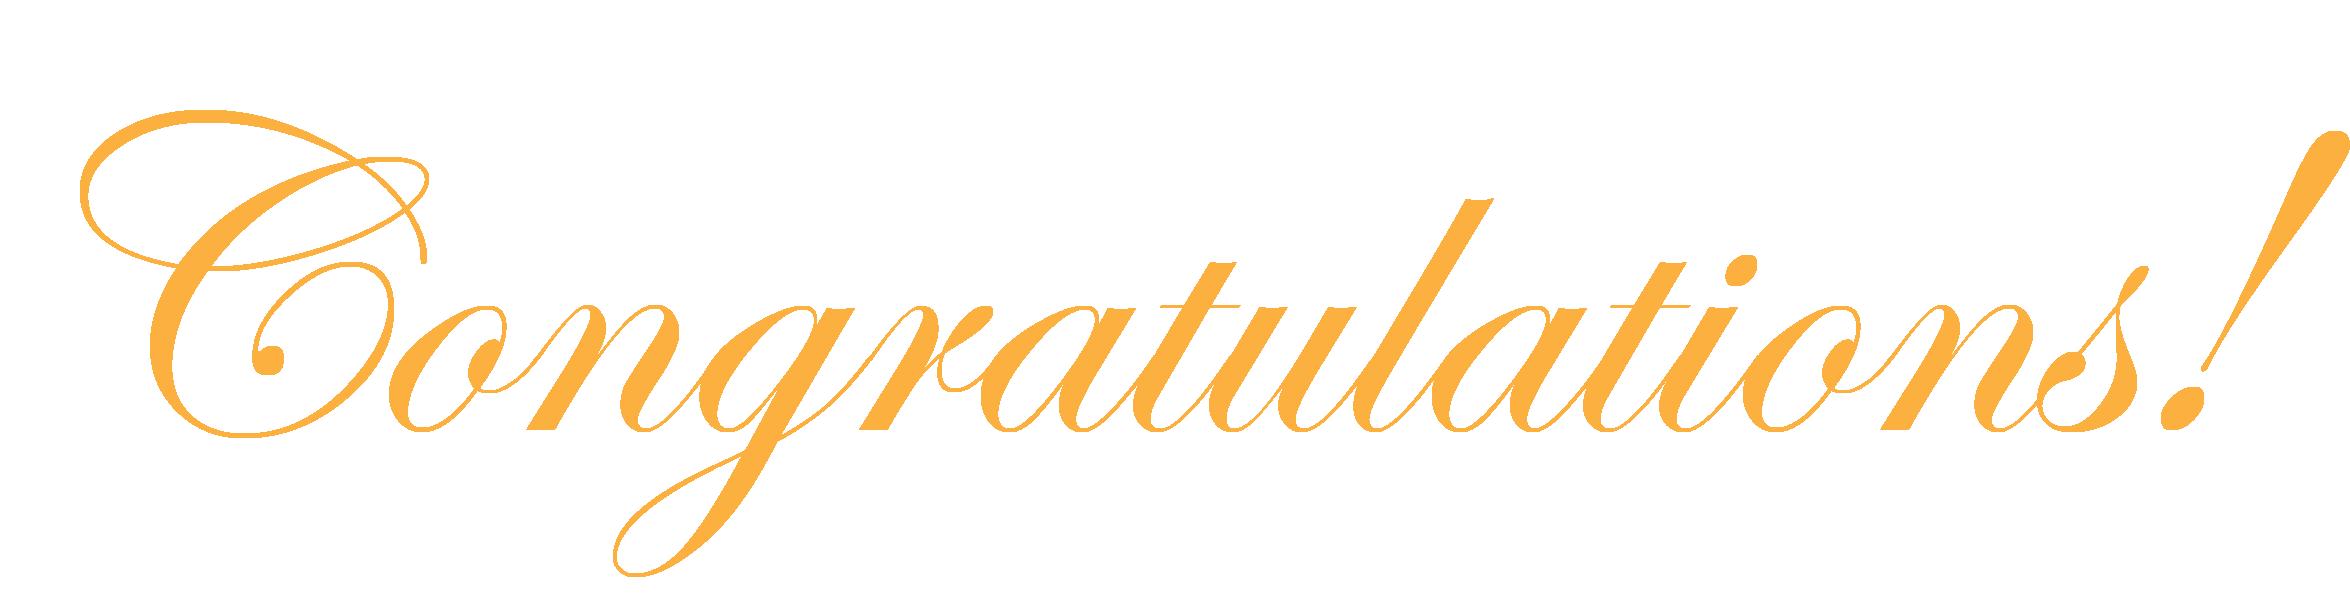 Congratulations clipart congratulation class 2016. Free png image alphabet